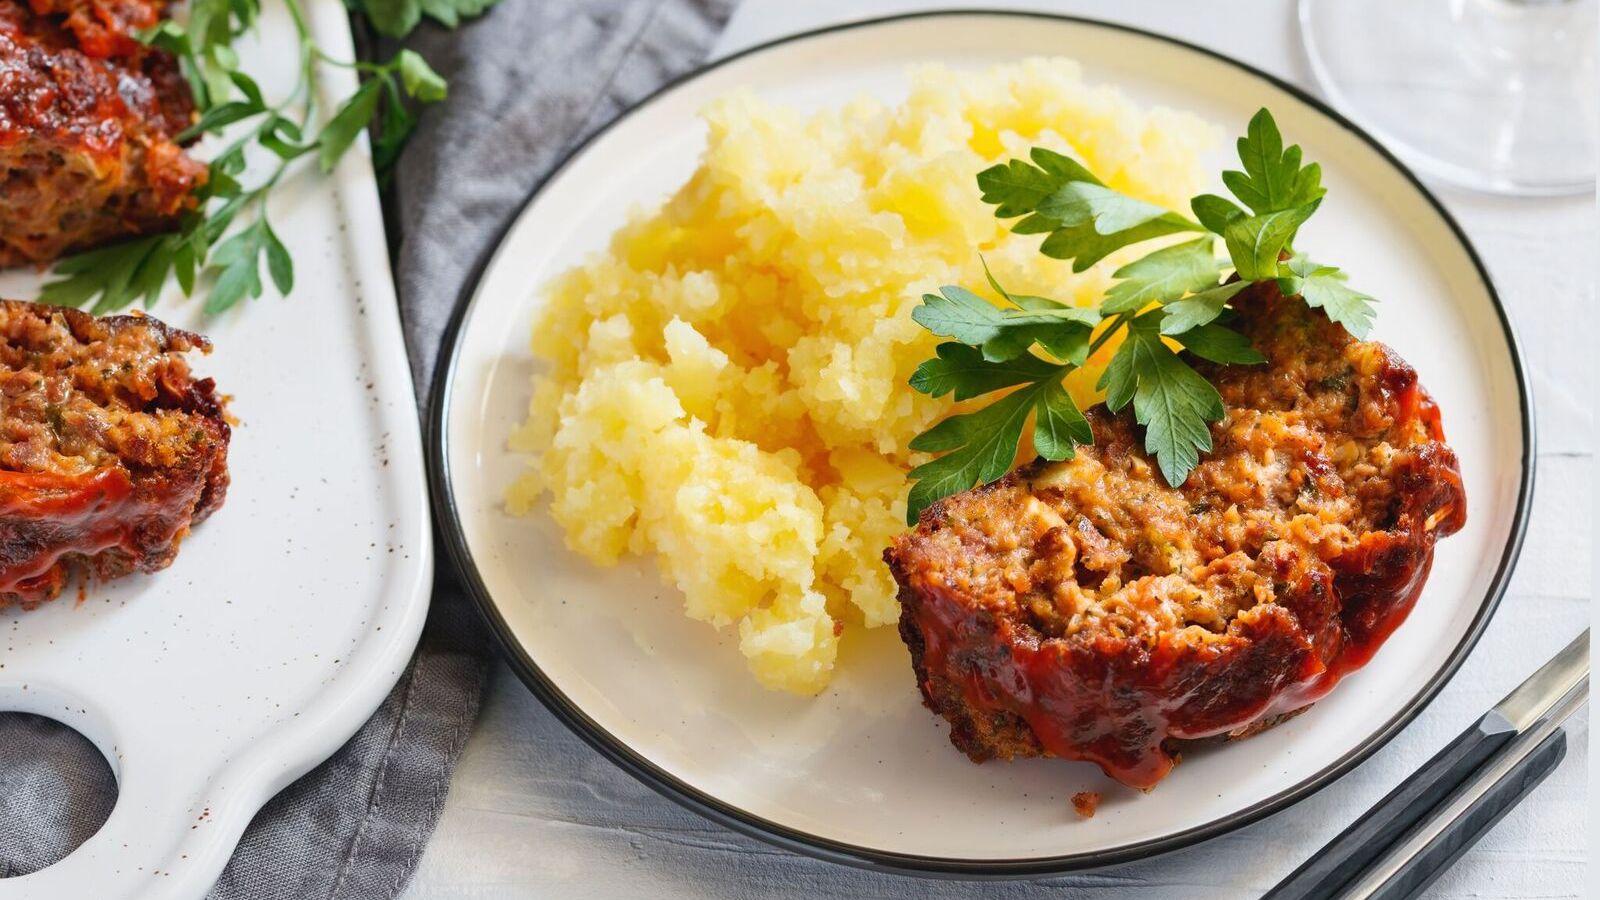 Chicken Recipes With Lipton Onion Soup Mix